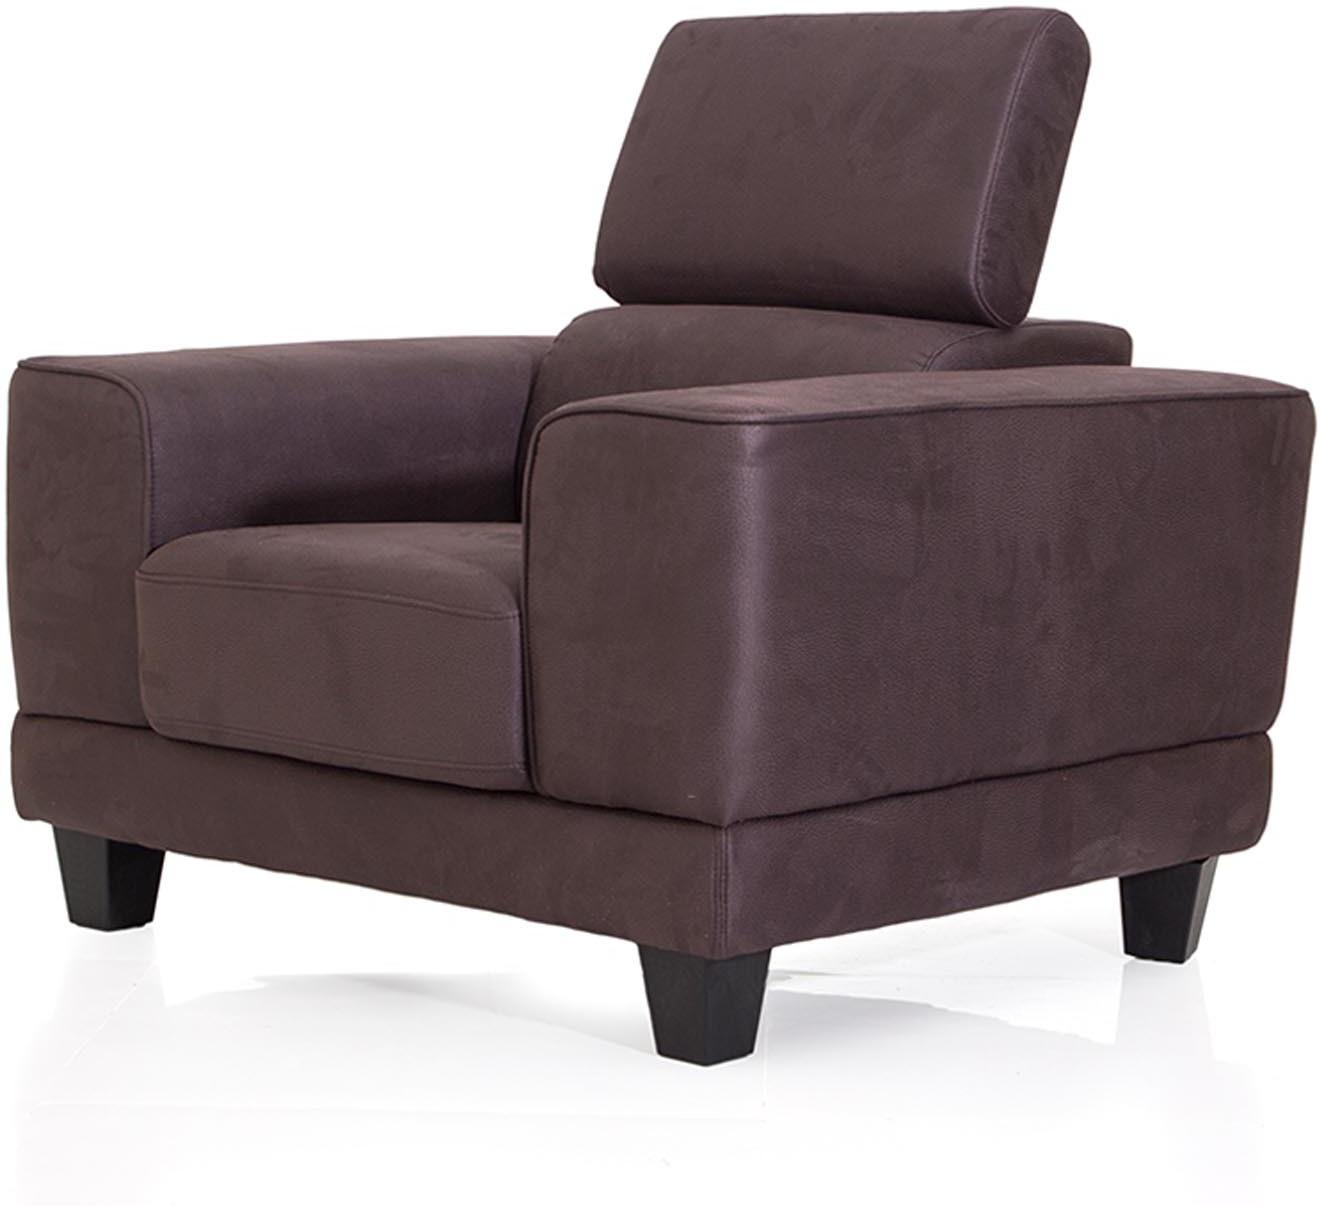 View Evok Delite Fabric 1 Seater Sofa(Finish Color - Grey) Price Online(Evok)